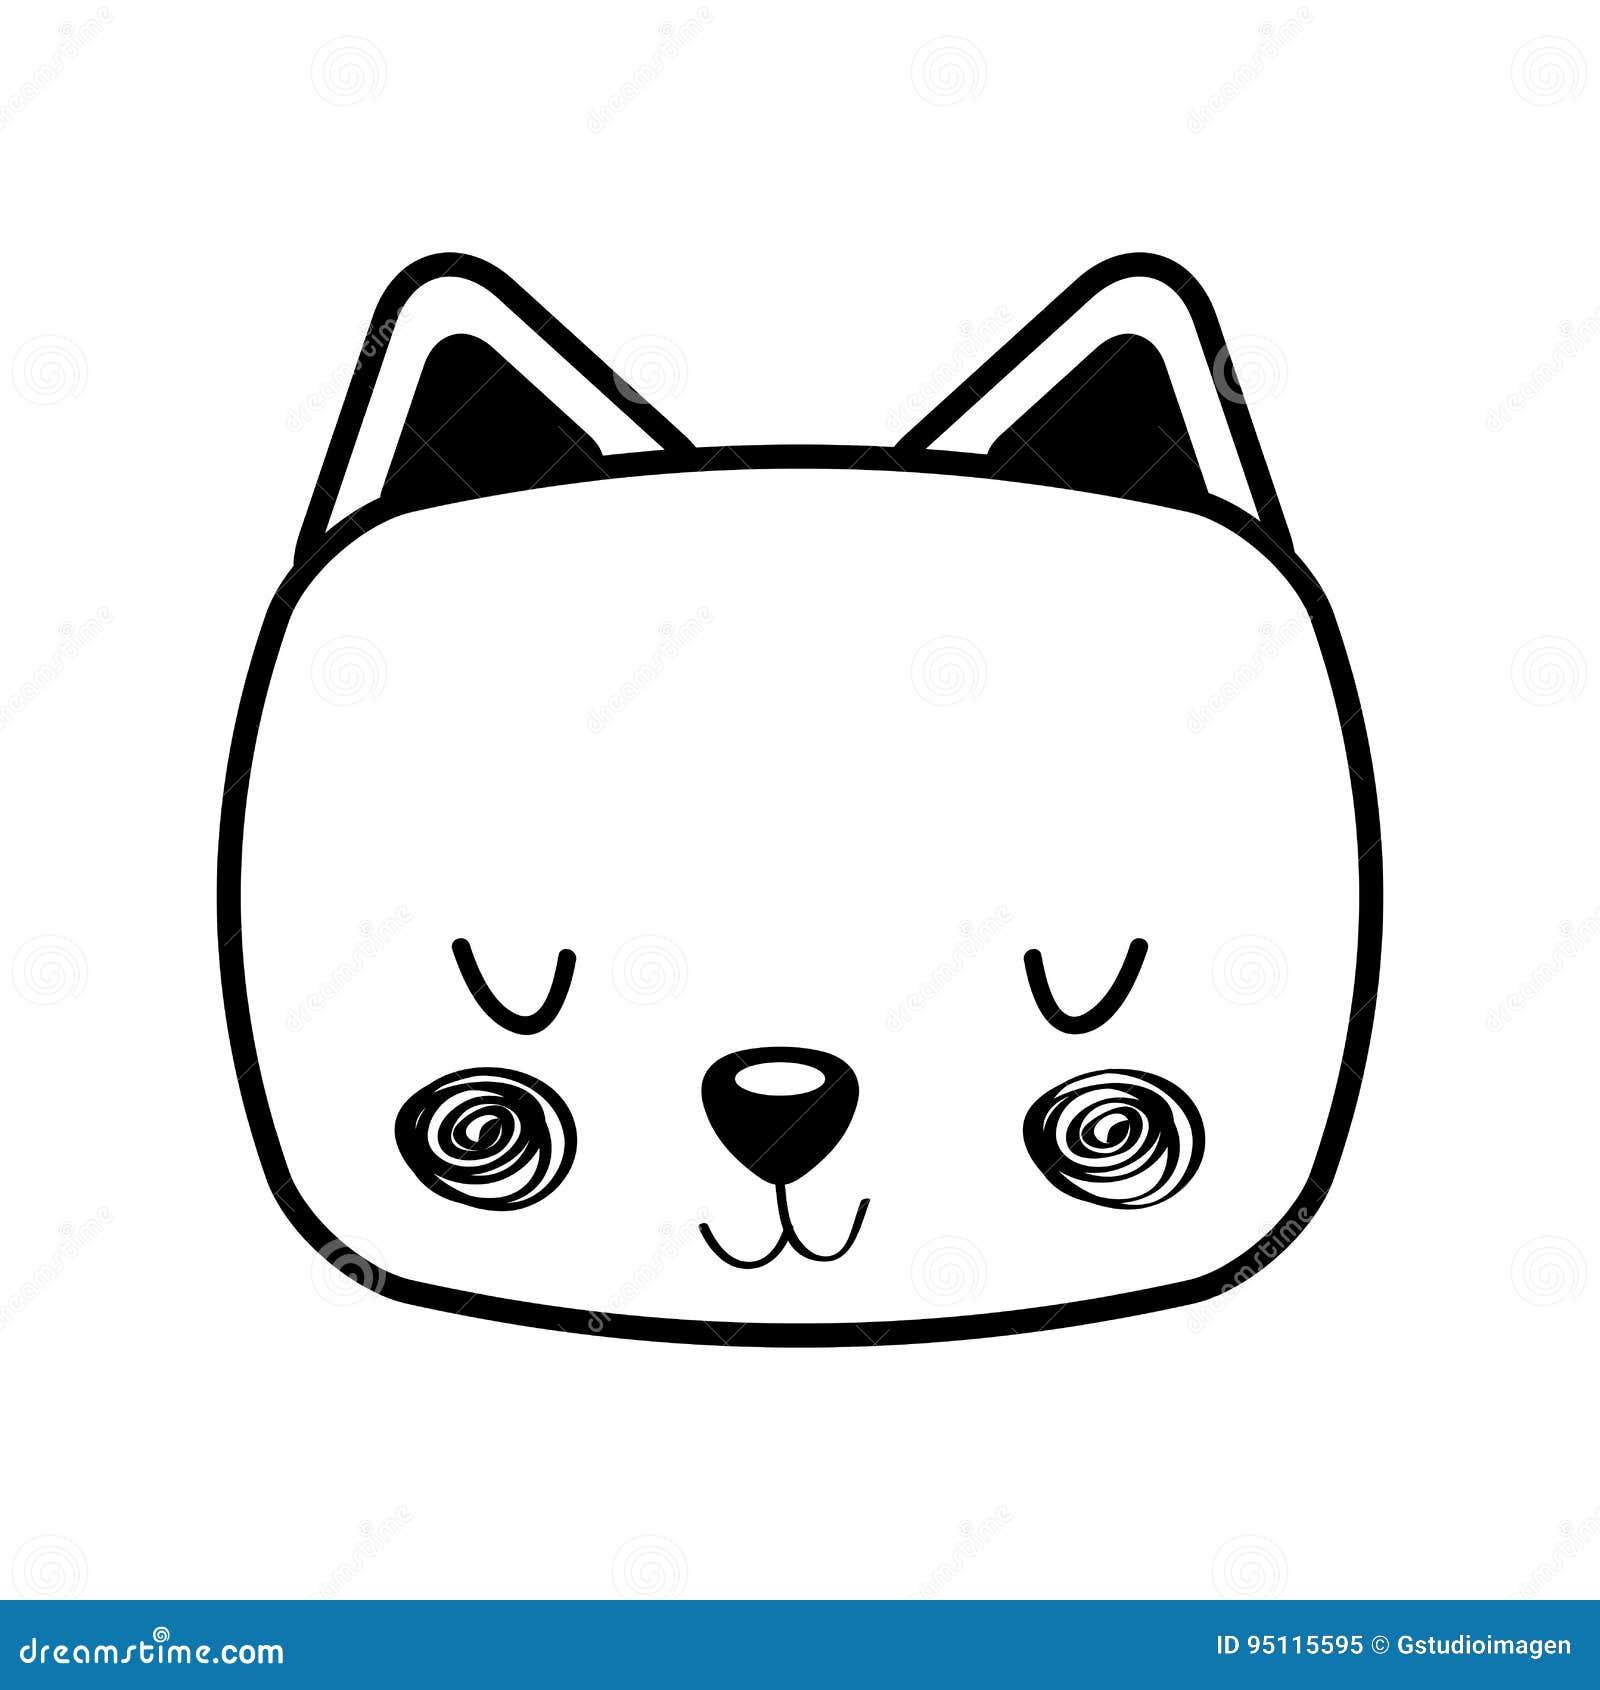 Animal Cat Cartoon Stock Vector Illustration Of Design 95115595